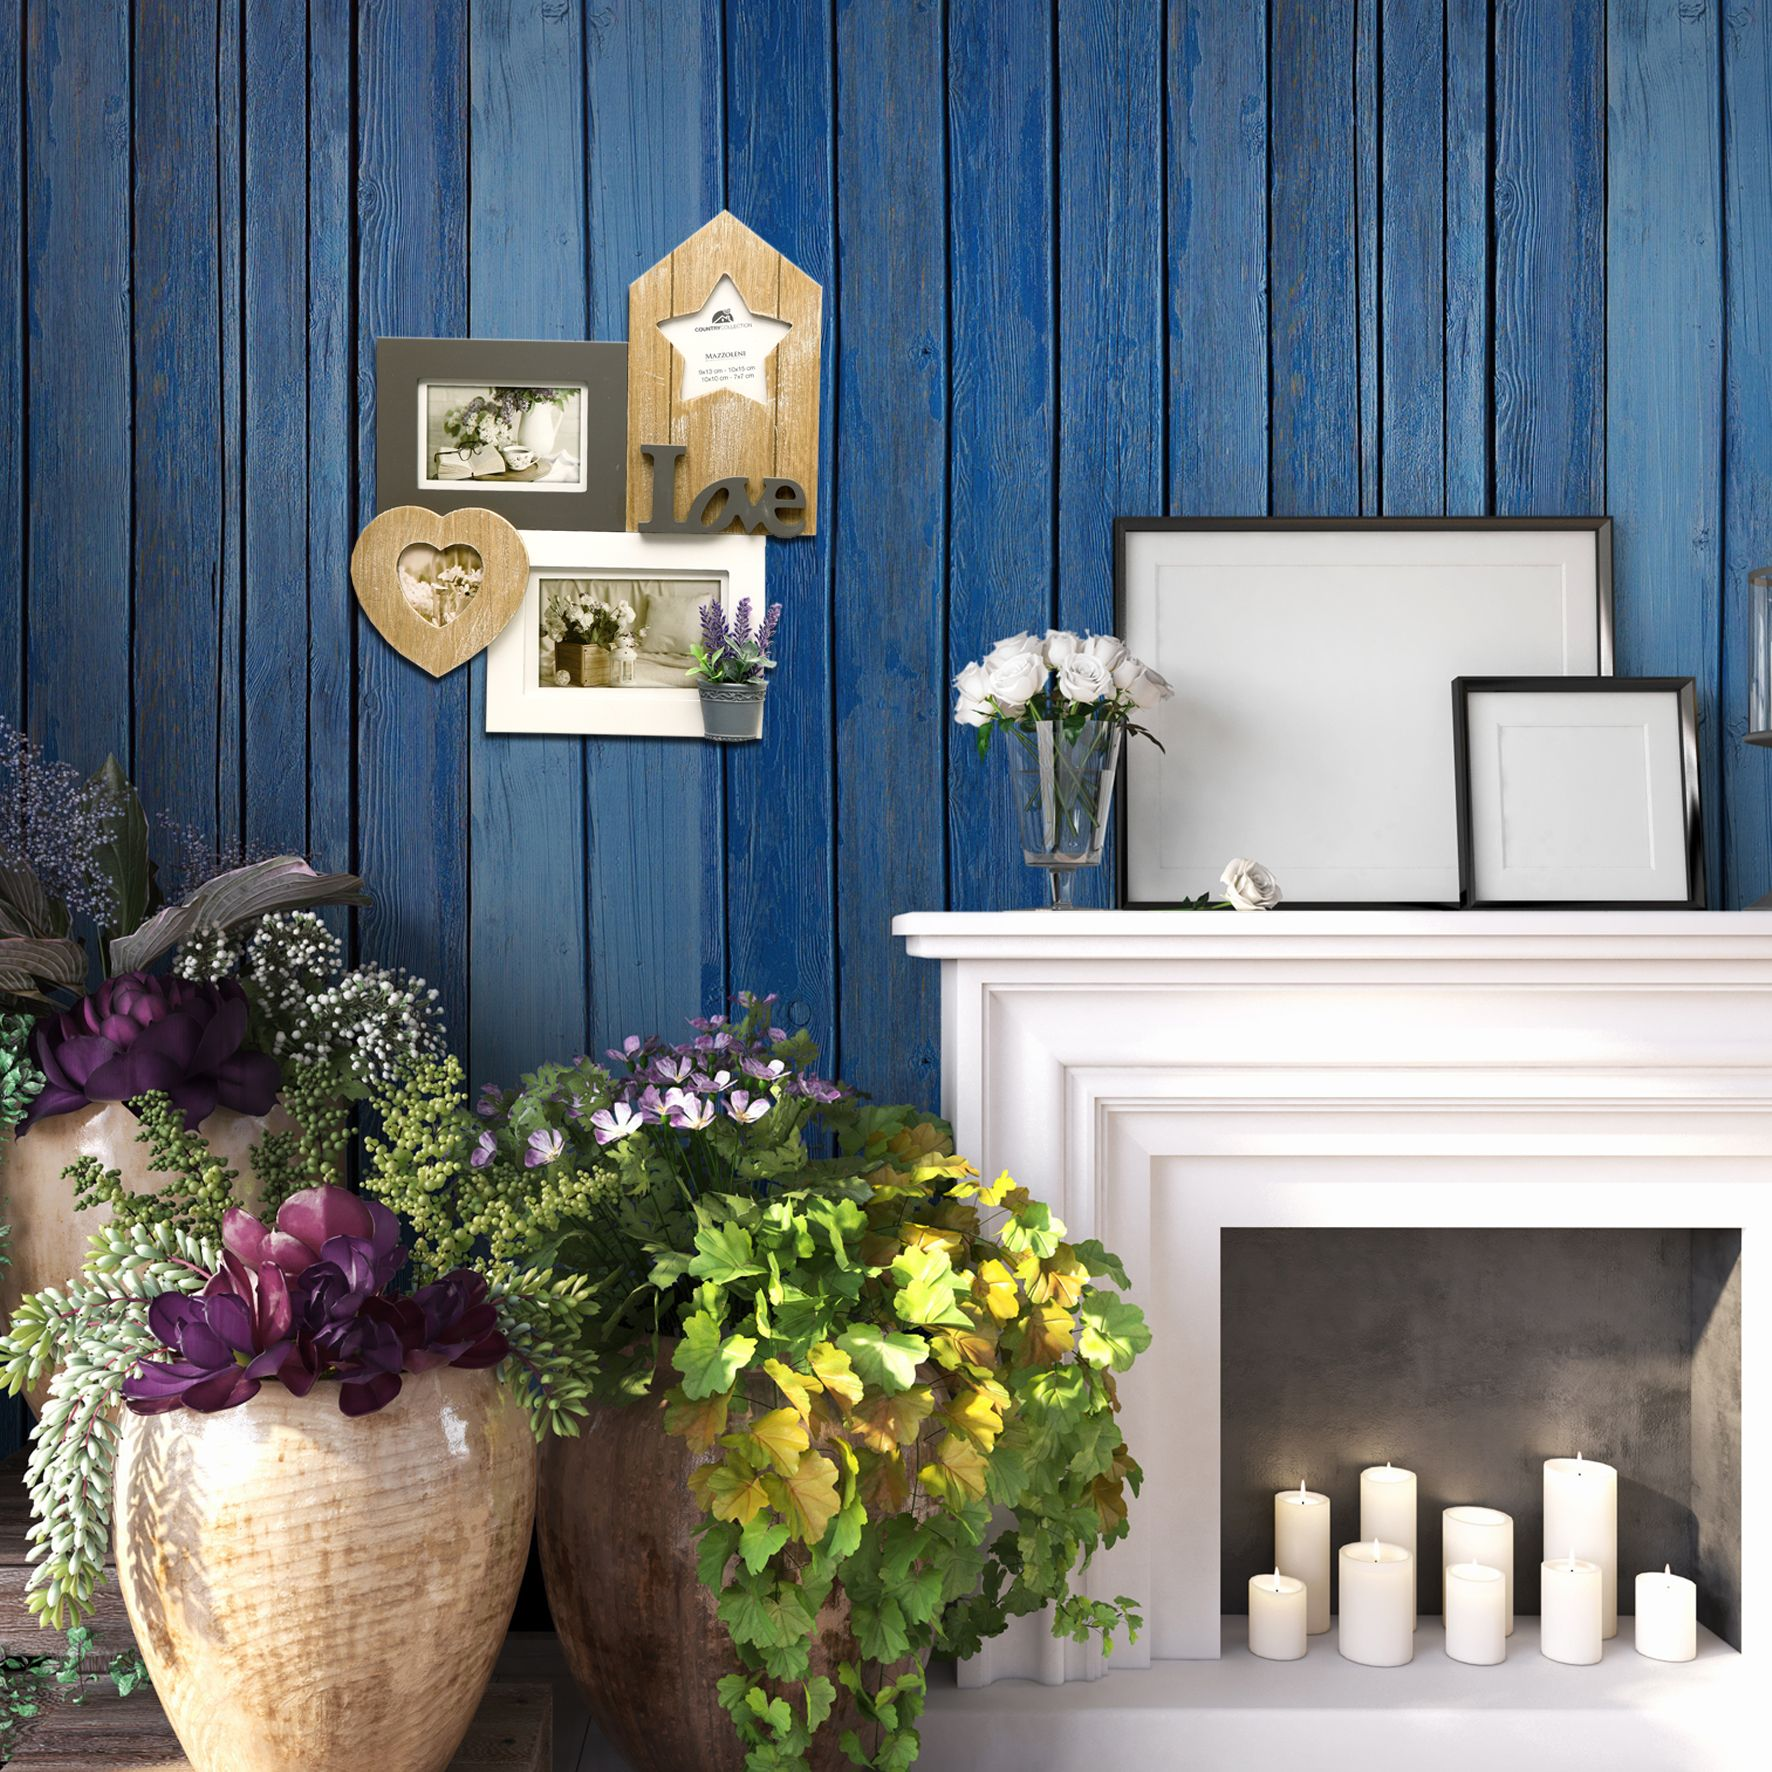 Pittura Shabby Leroy Merlin cornice multifoto love home shabby bianco 4 foto | shabby